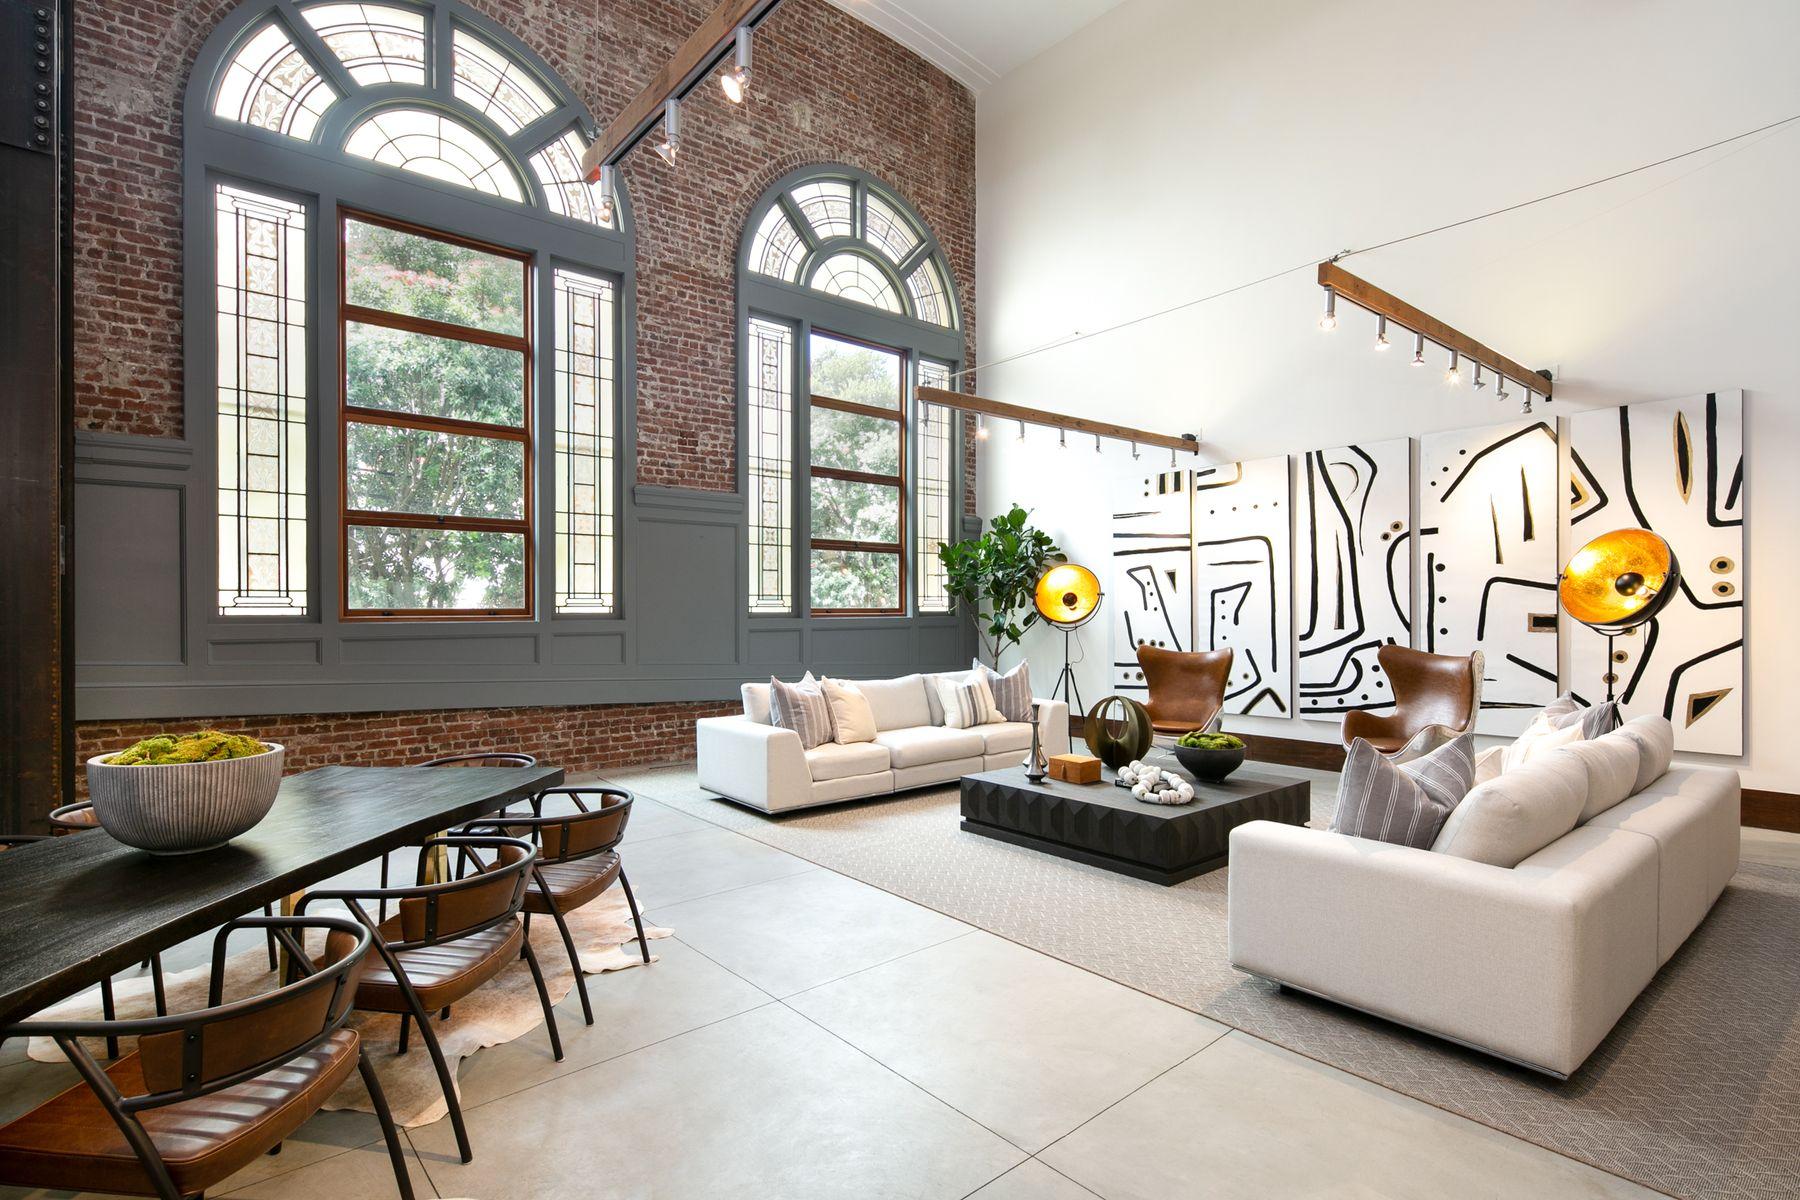 Condominiums 为 销售 在 The Light House at Dolores Park 651 Dolores St 旧金山, 加利福尼亚州 94110 美国